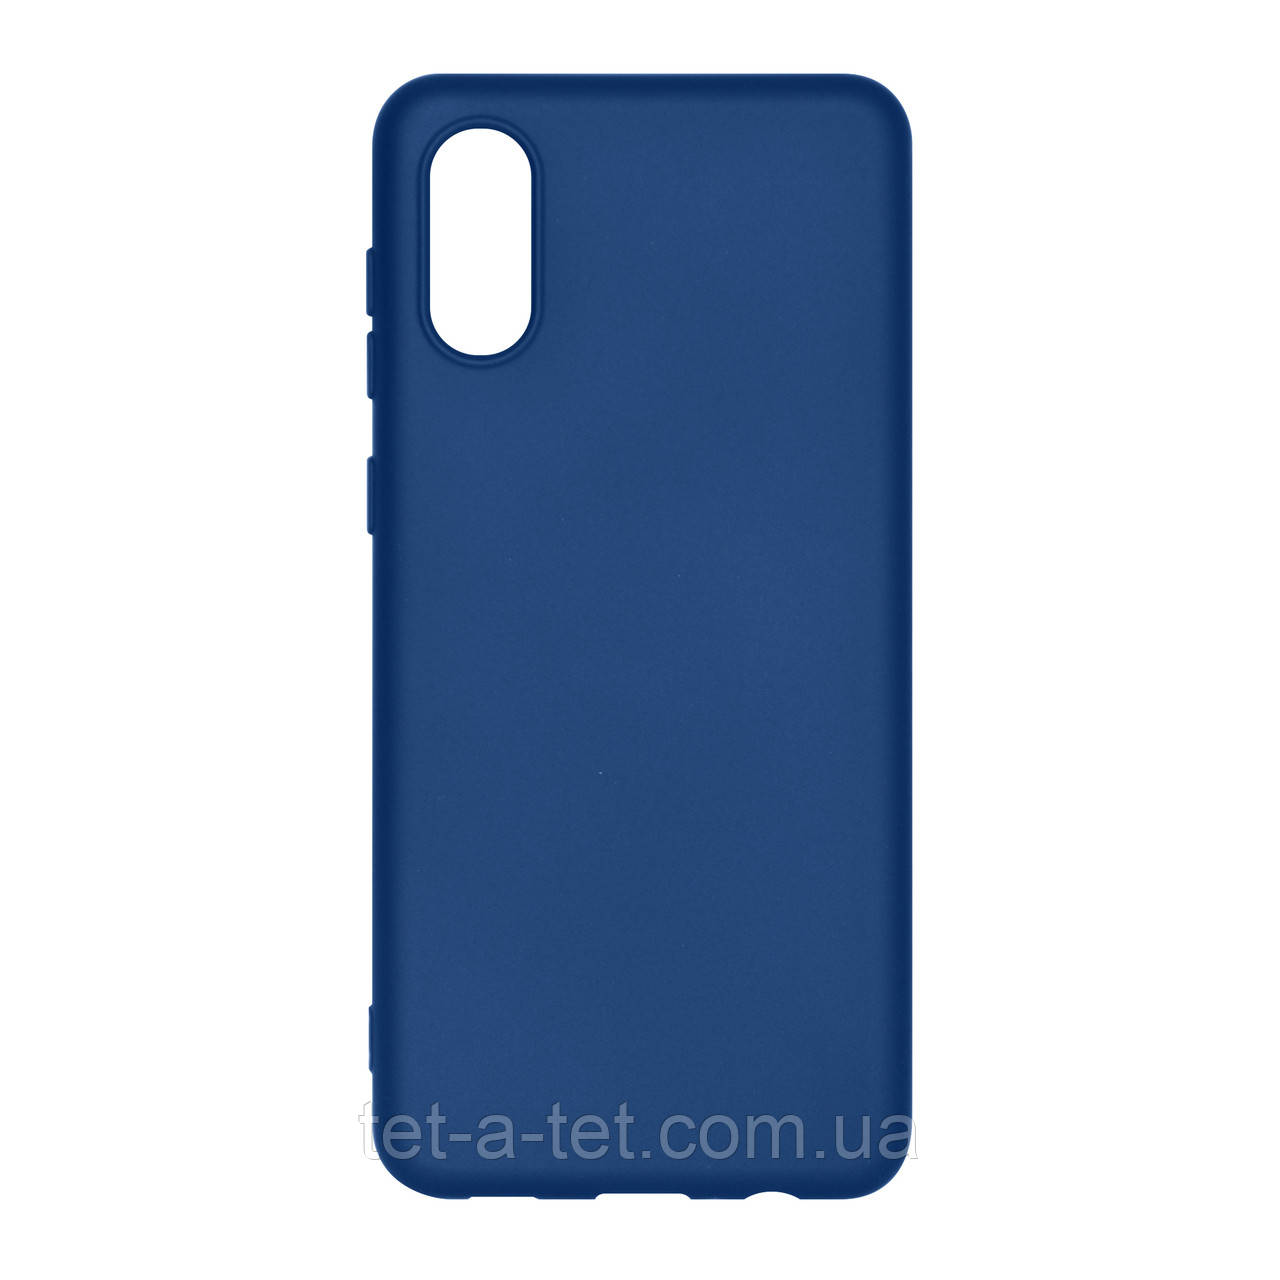 Чохол силіконовий ArmorStandart ICON Case for Samsung A02 (A022) Dark Blue